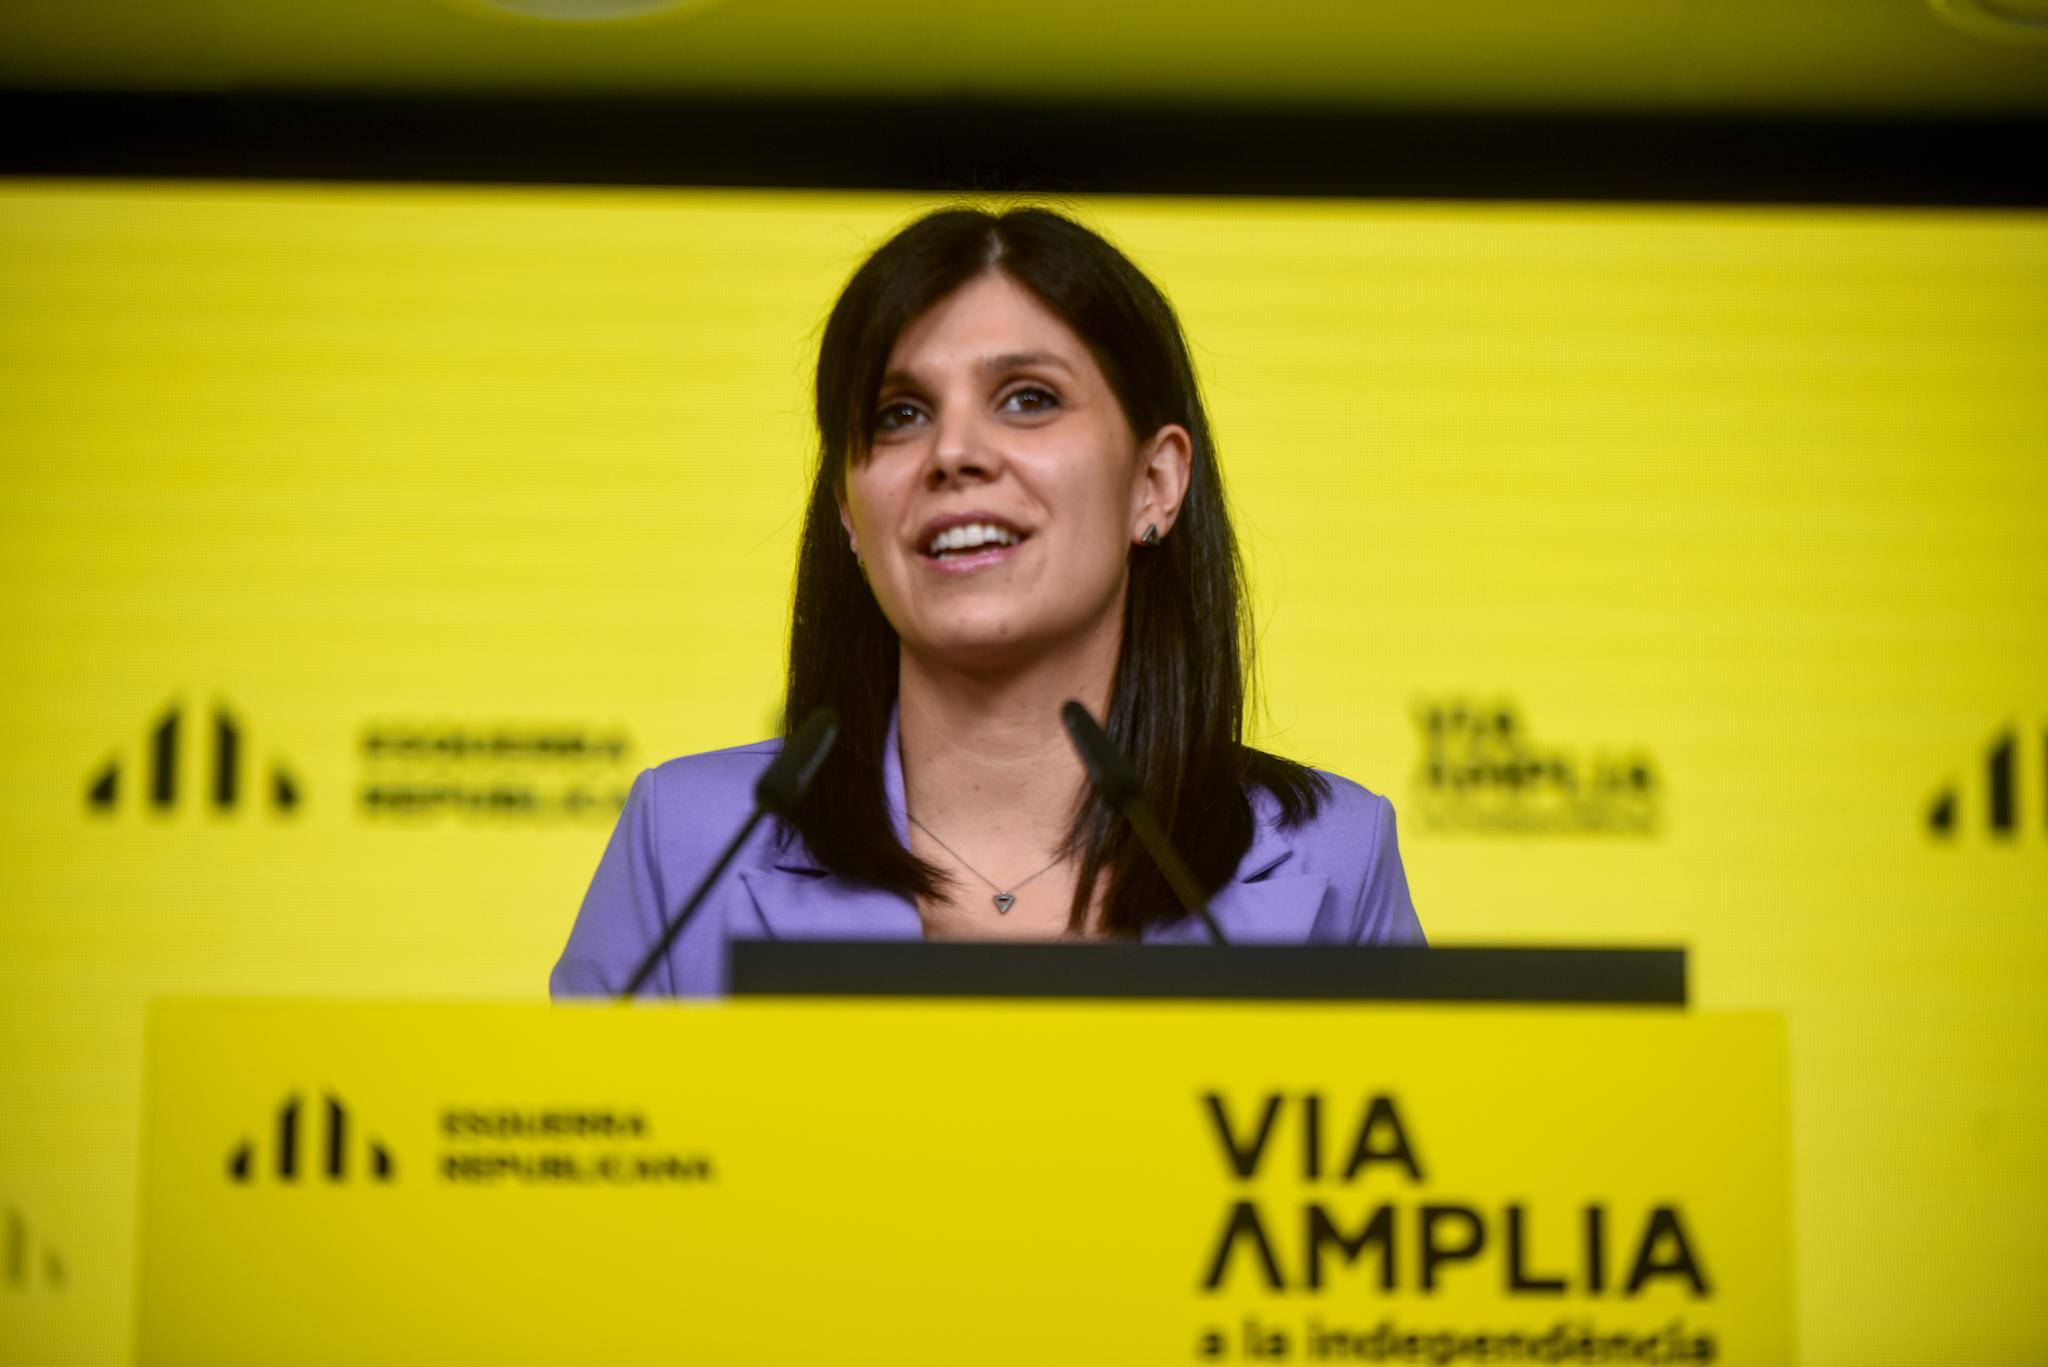 La portavoz de ERC, Marta Vilalta, en una rueda de prensa / Marc Puig (ERC)